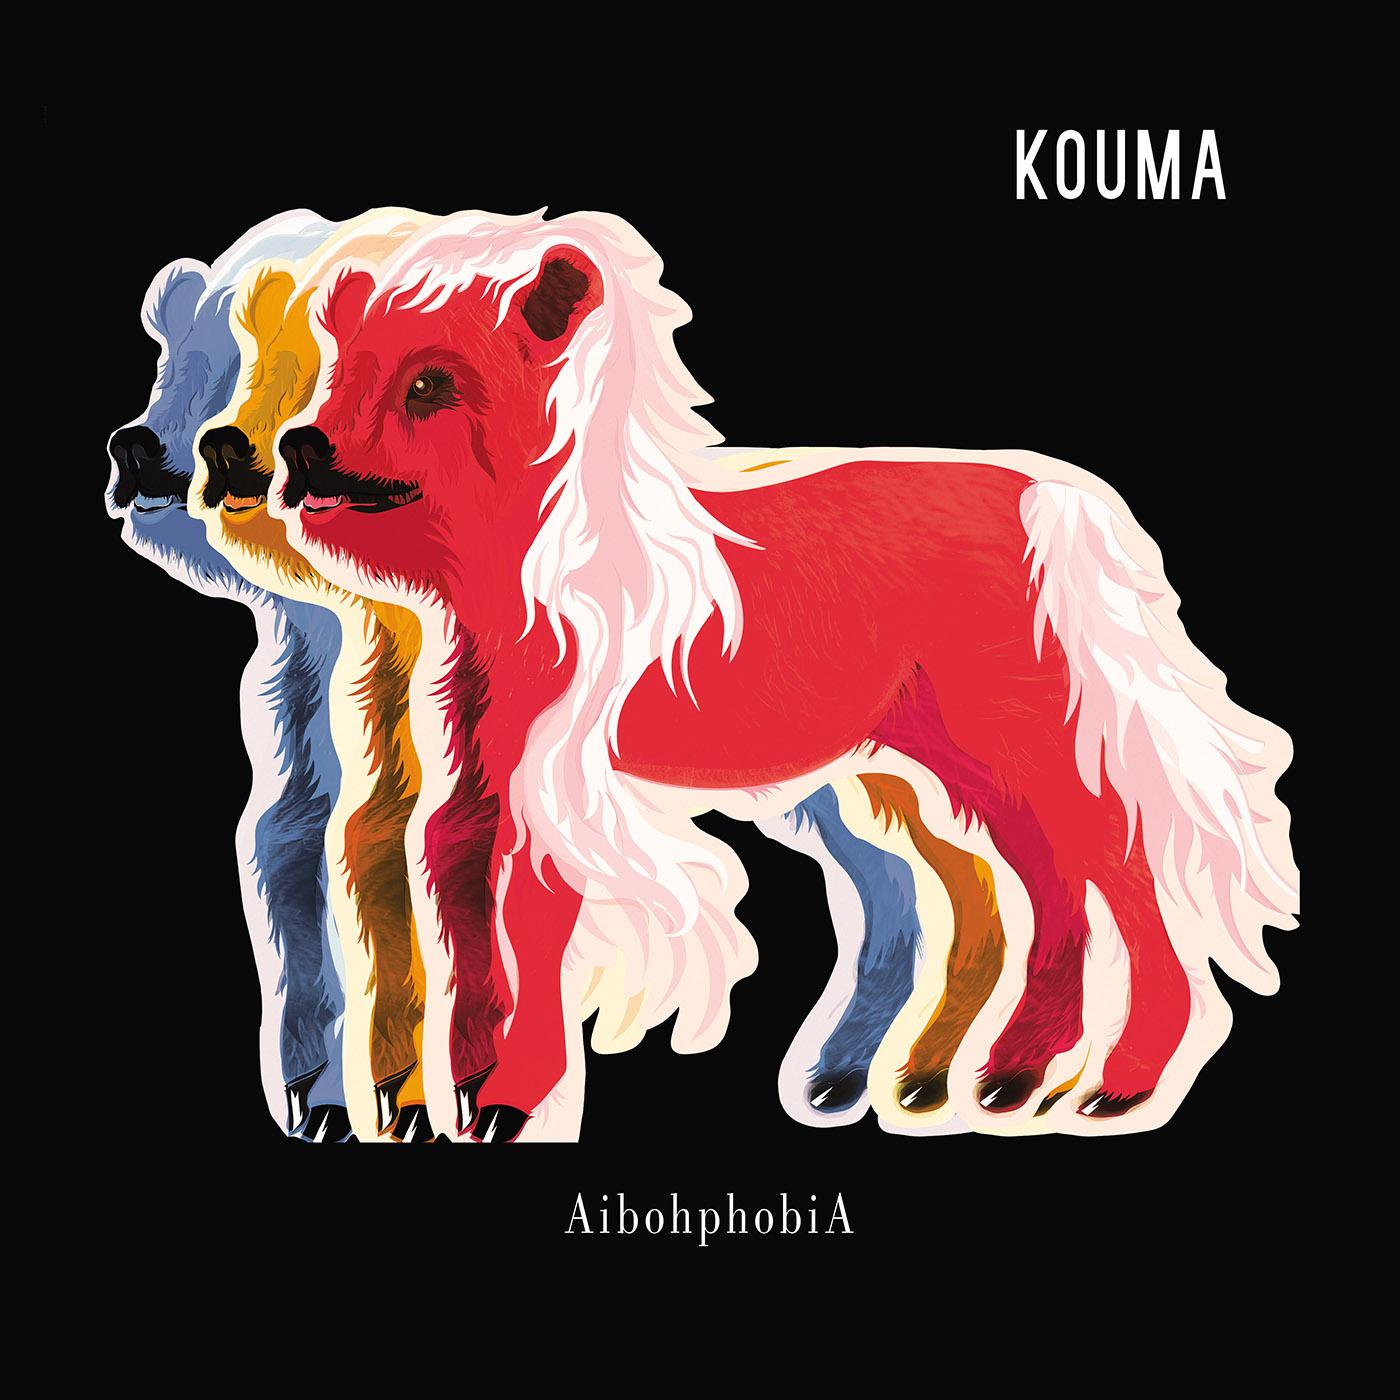 KOUMA- AIBOHPHOBIA